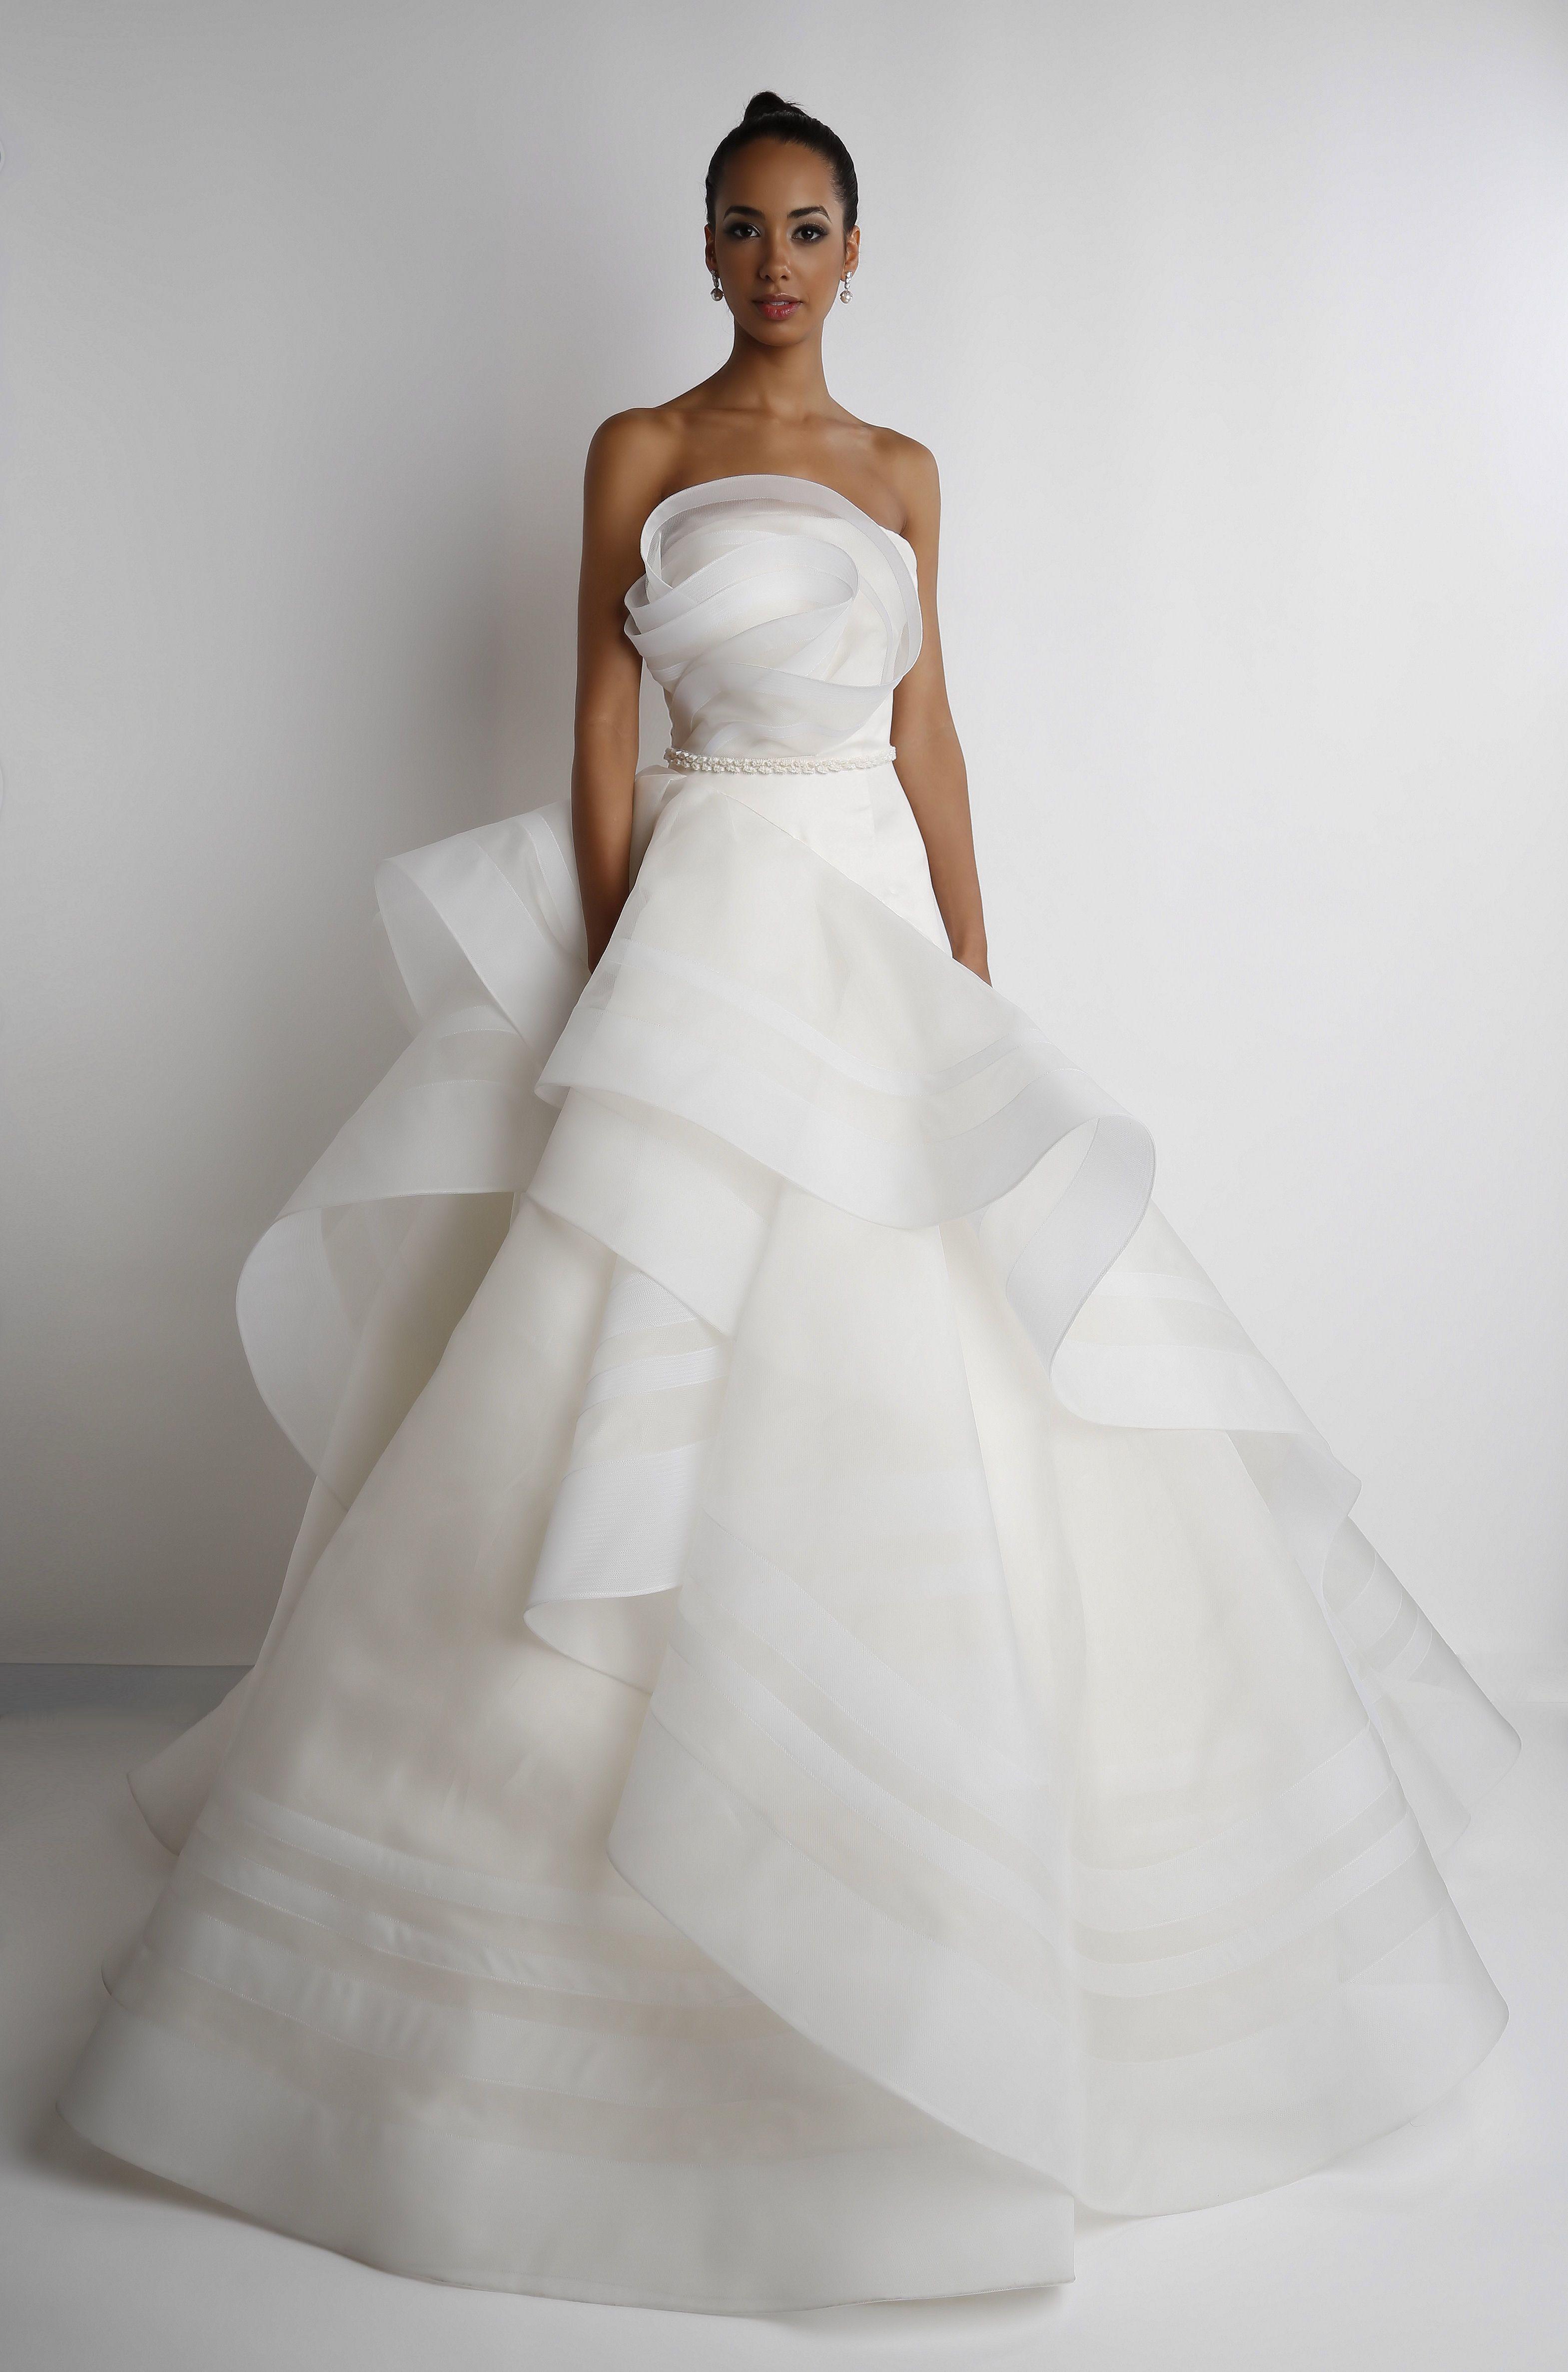 Quinn Bridal Gown by Rafael Cennamo | Rafael Cennamo Fashion ...